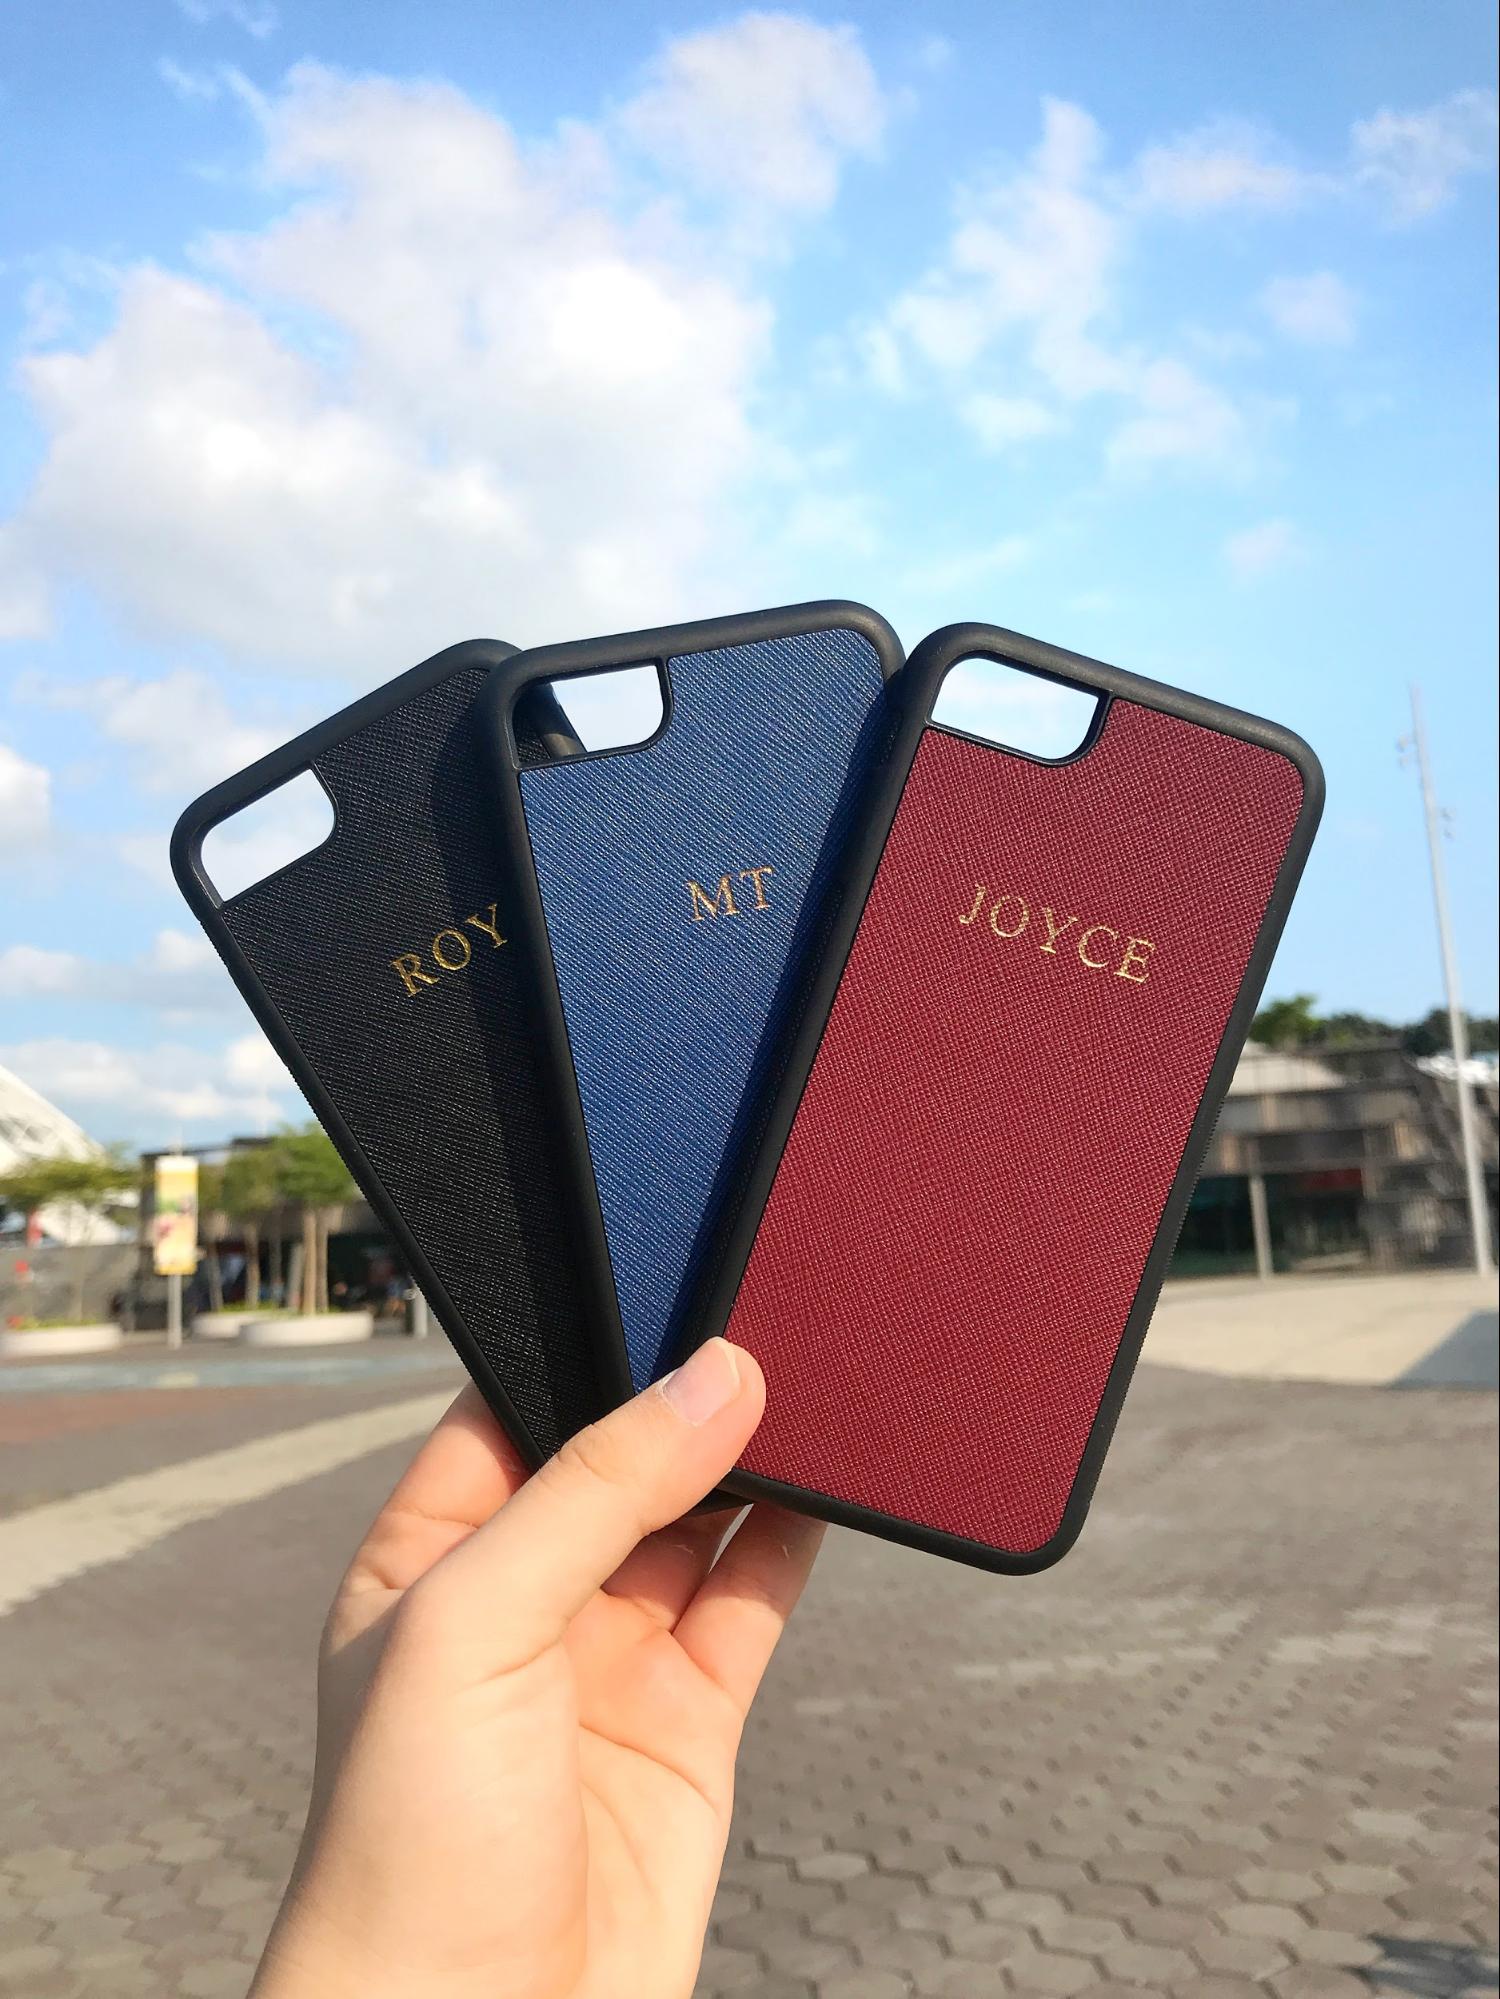 THEIMPRINT's phone cases